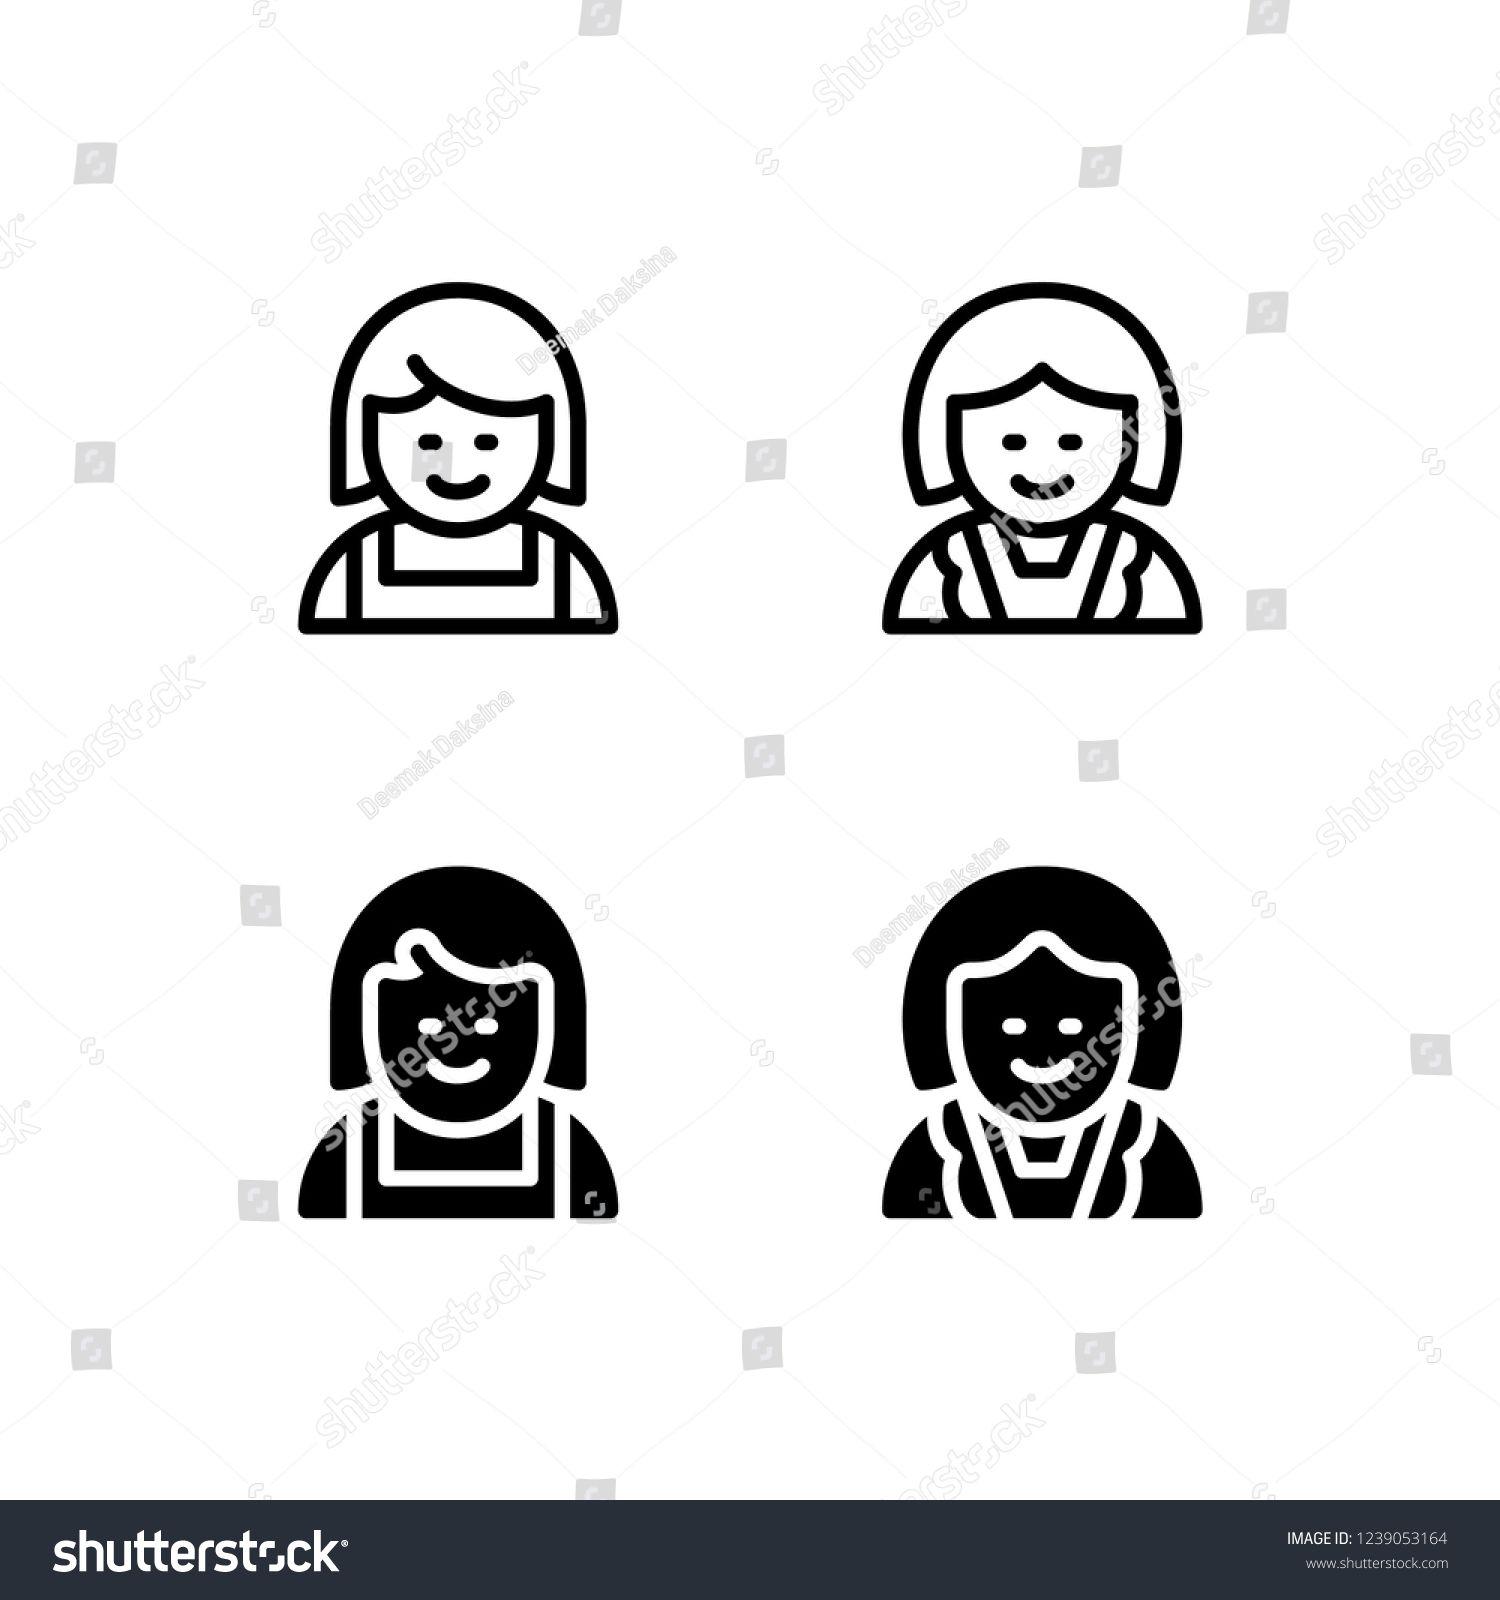 Maid Icon Design. maid, housekeeper, housewife